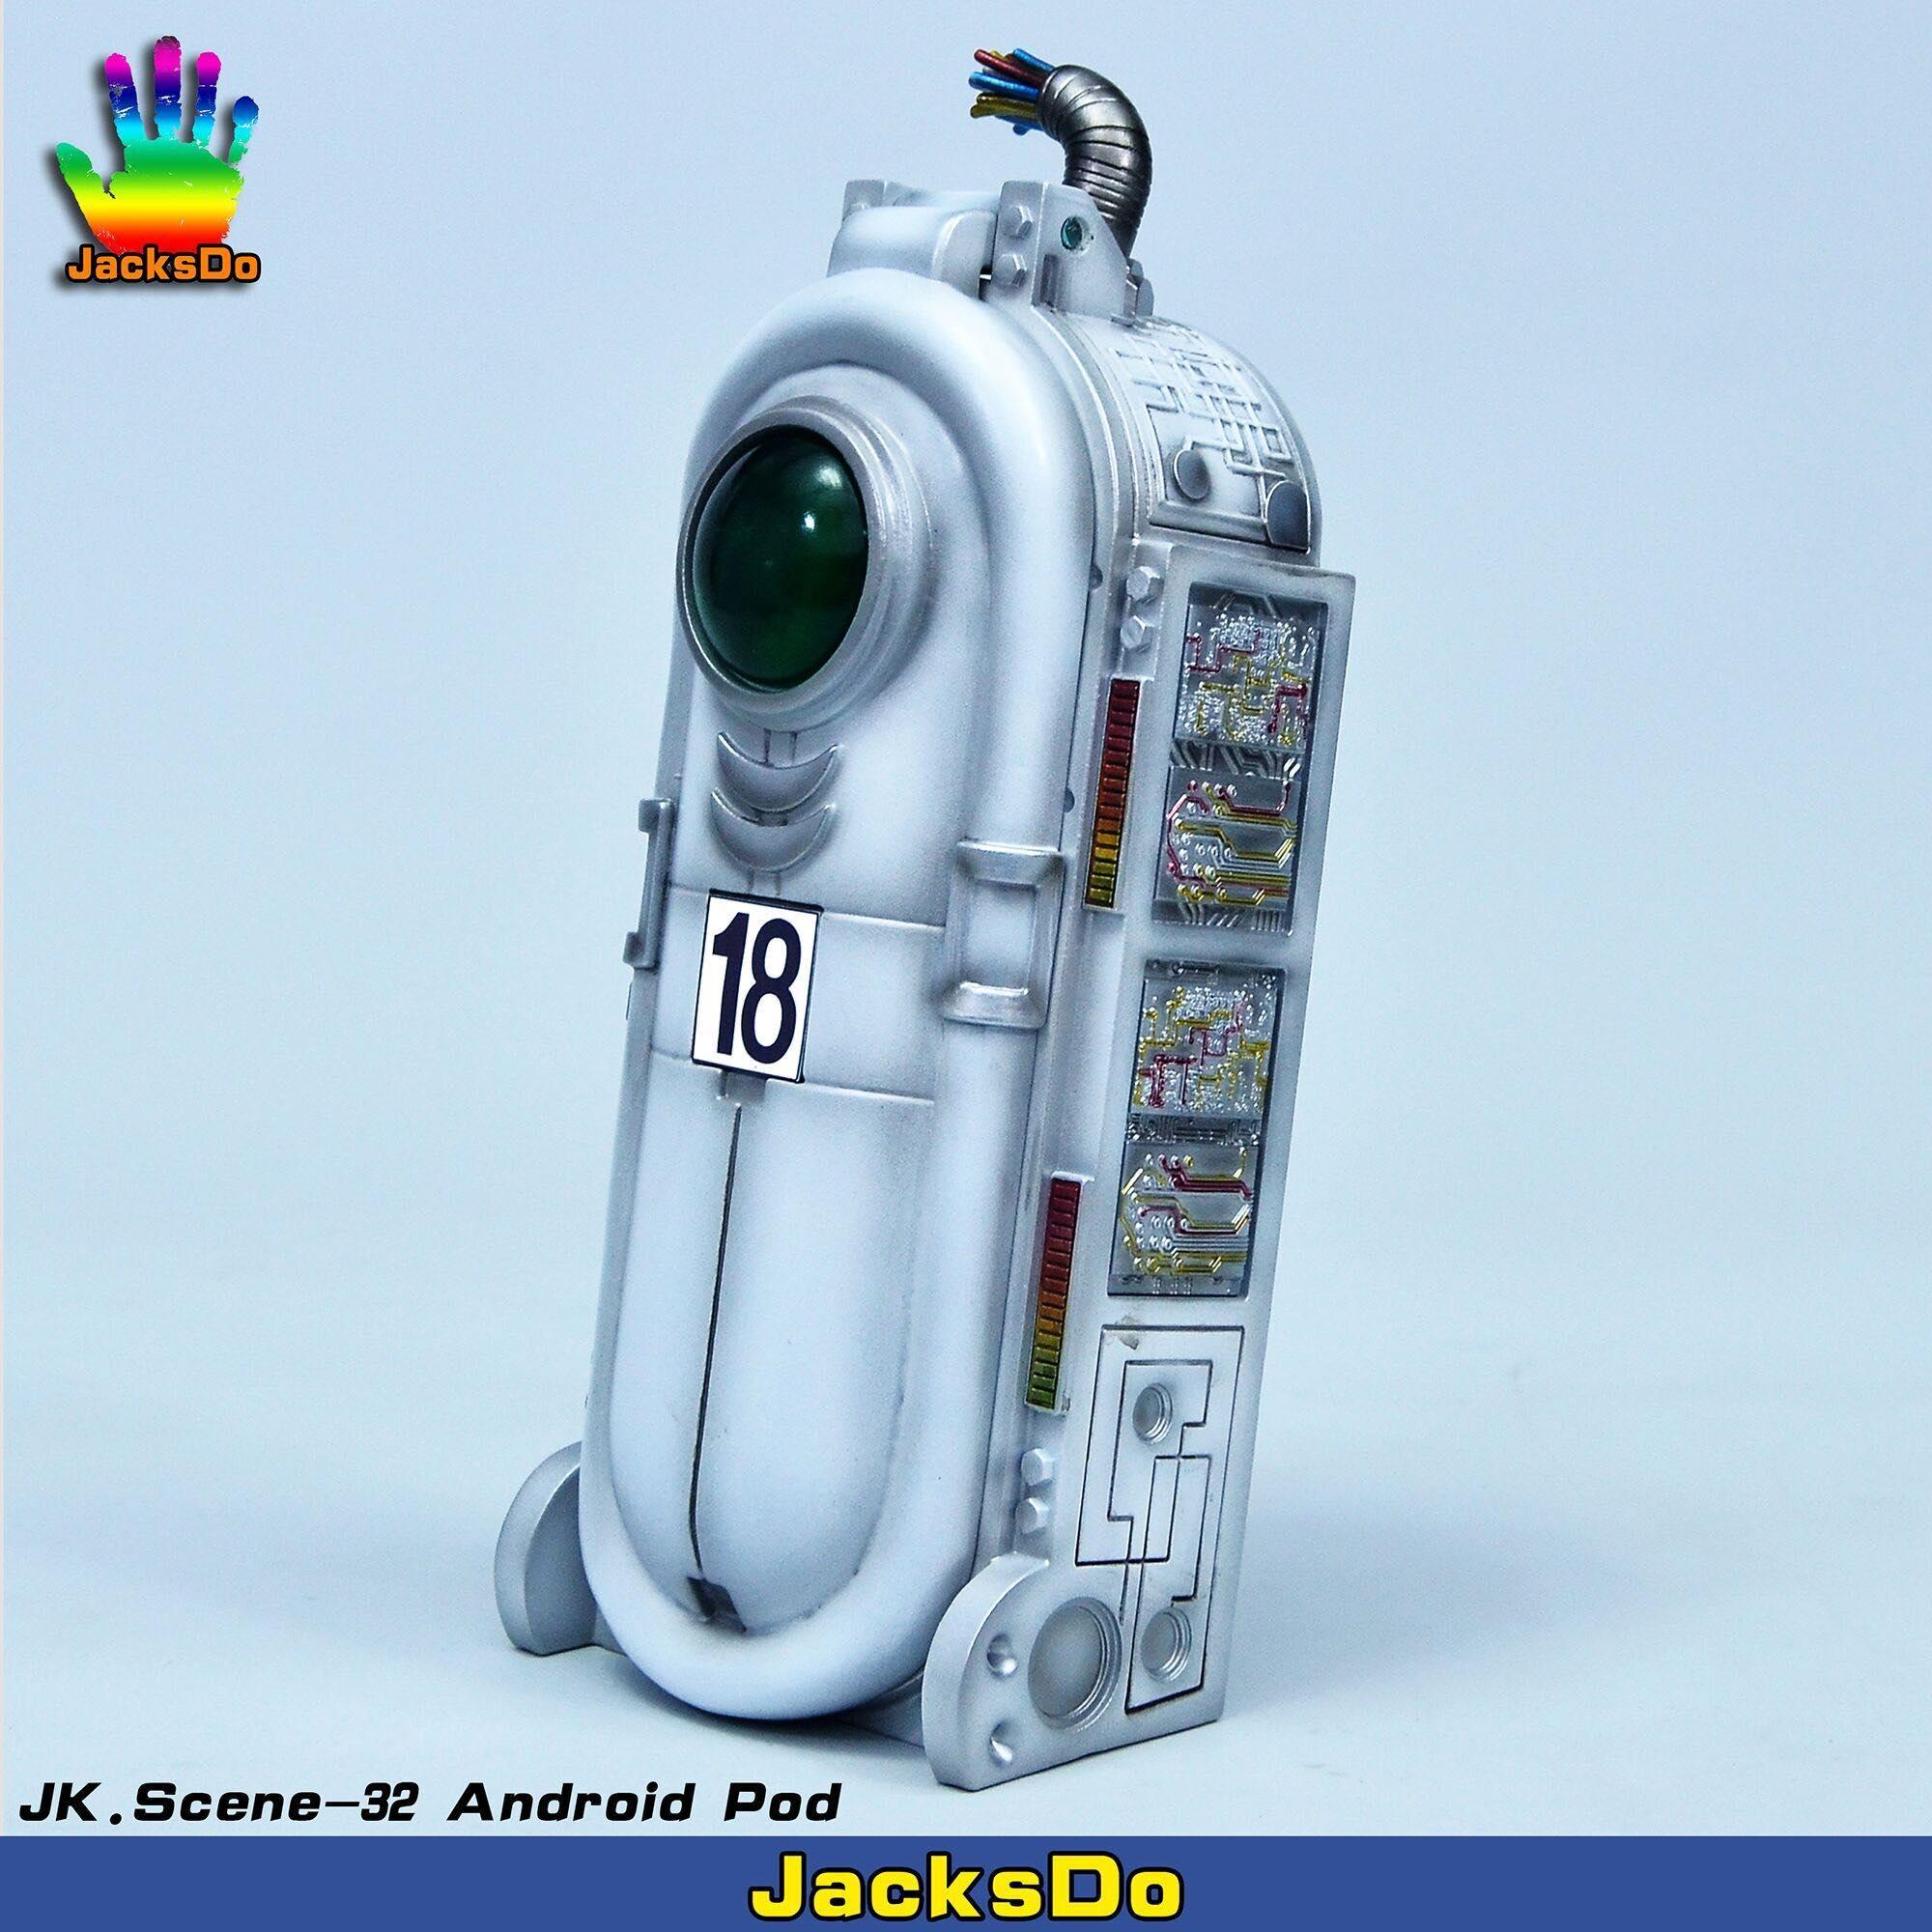 Android 18 Jacksdo